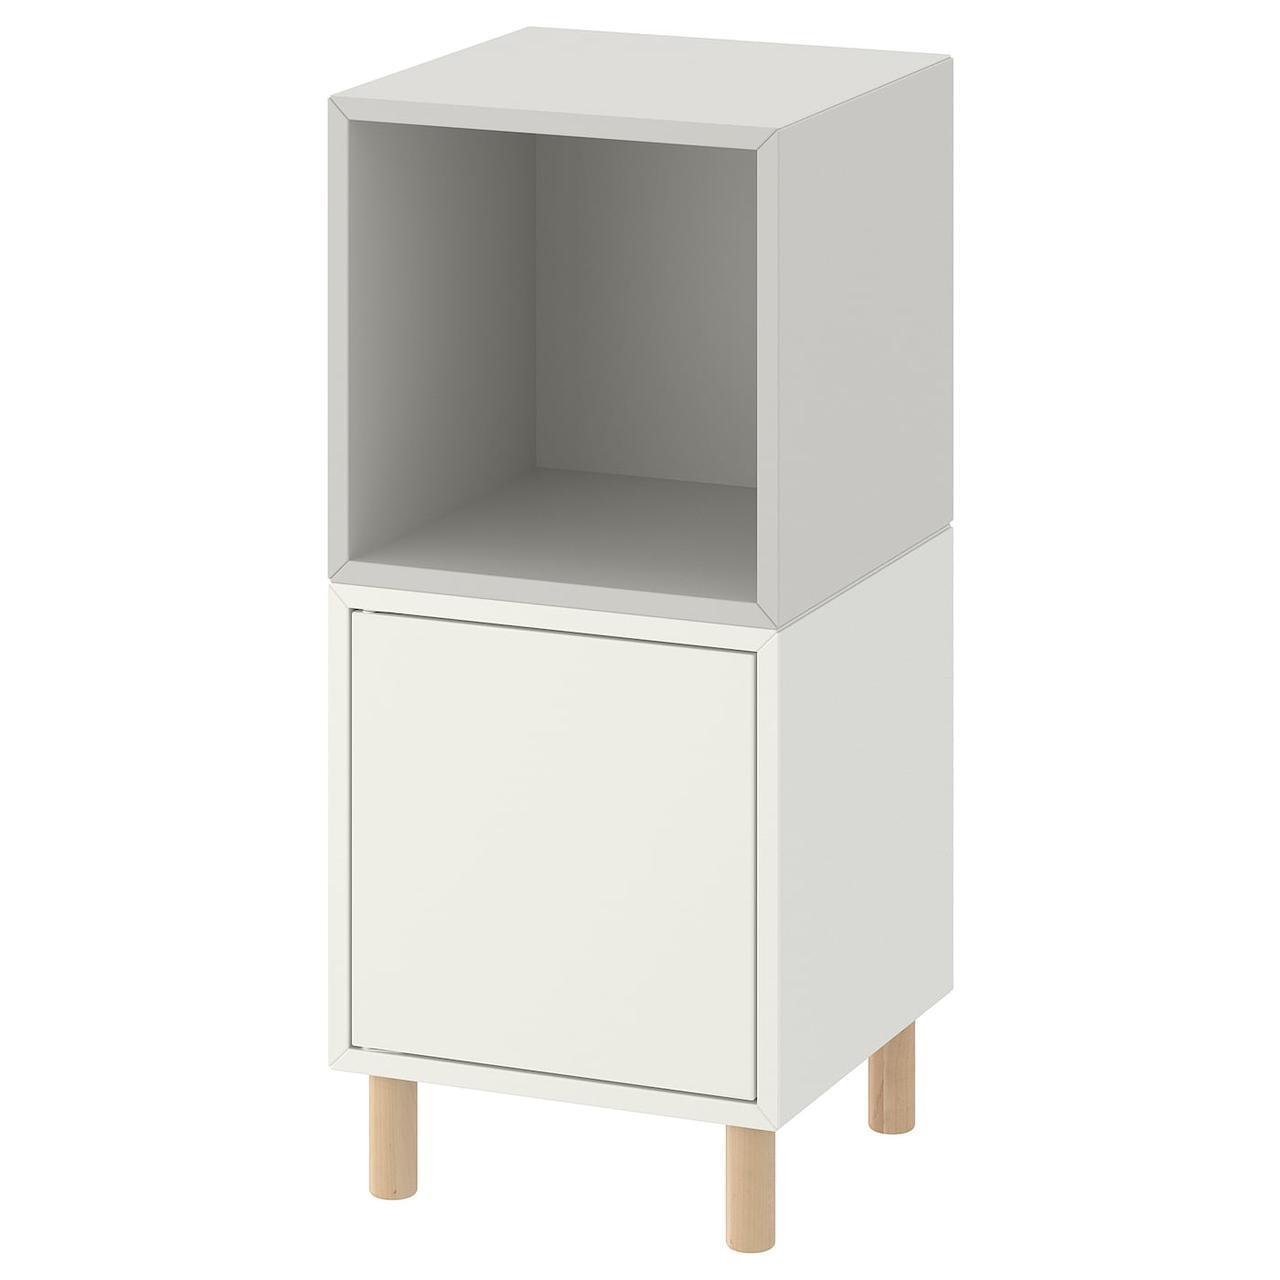 IKEA EKET (ІКЕА ЭКЕТ) 59386081